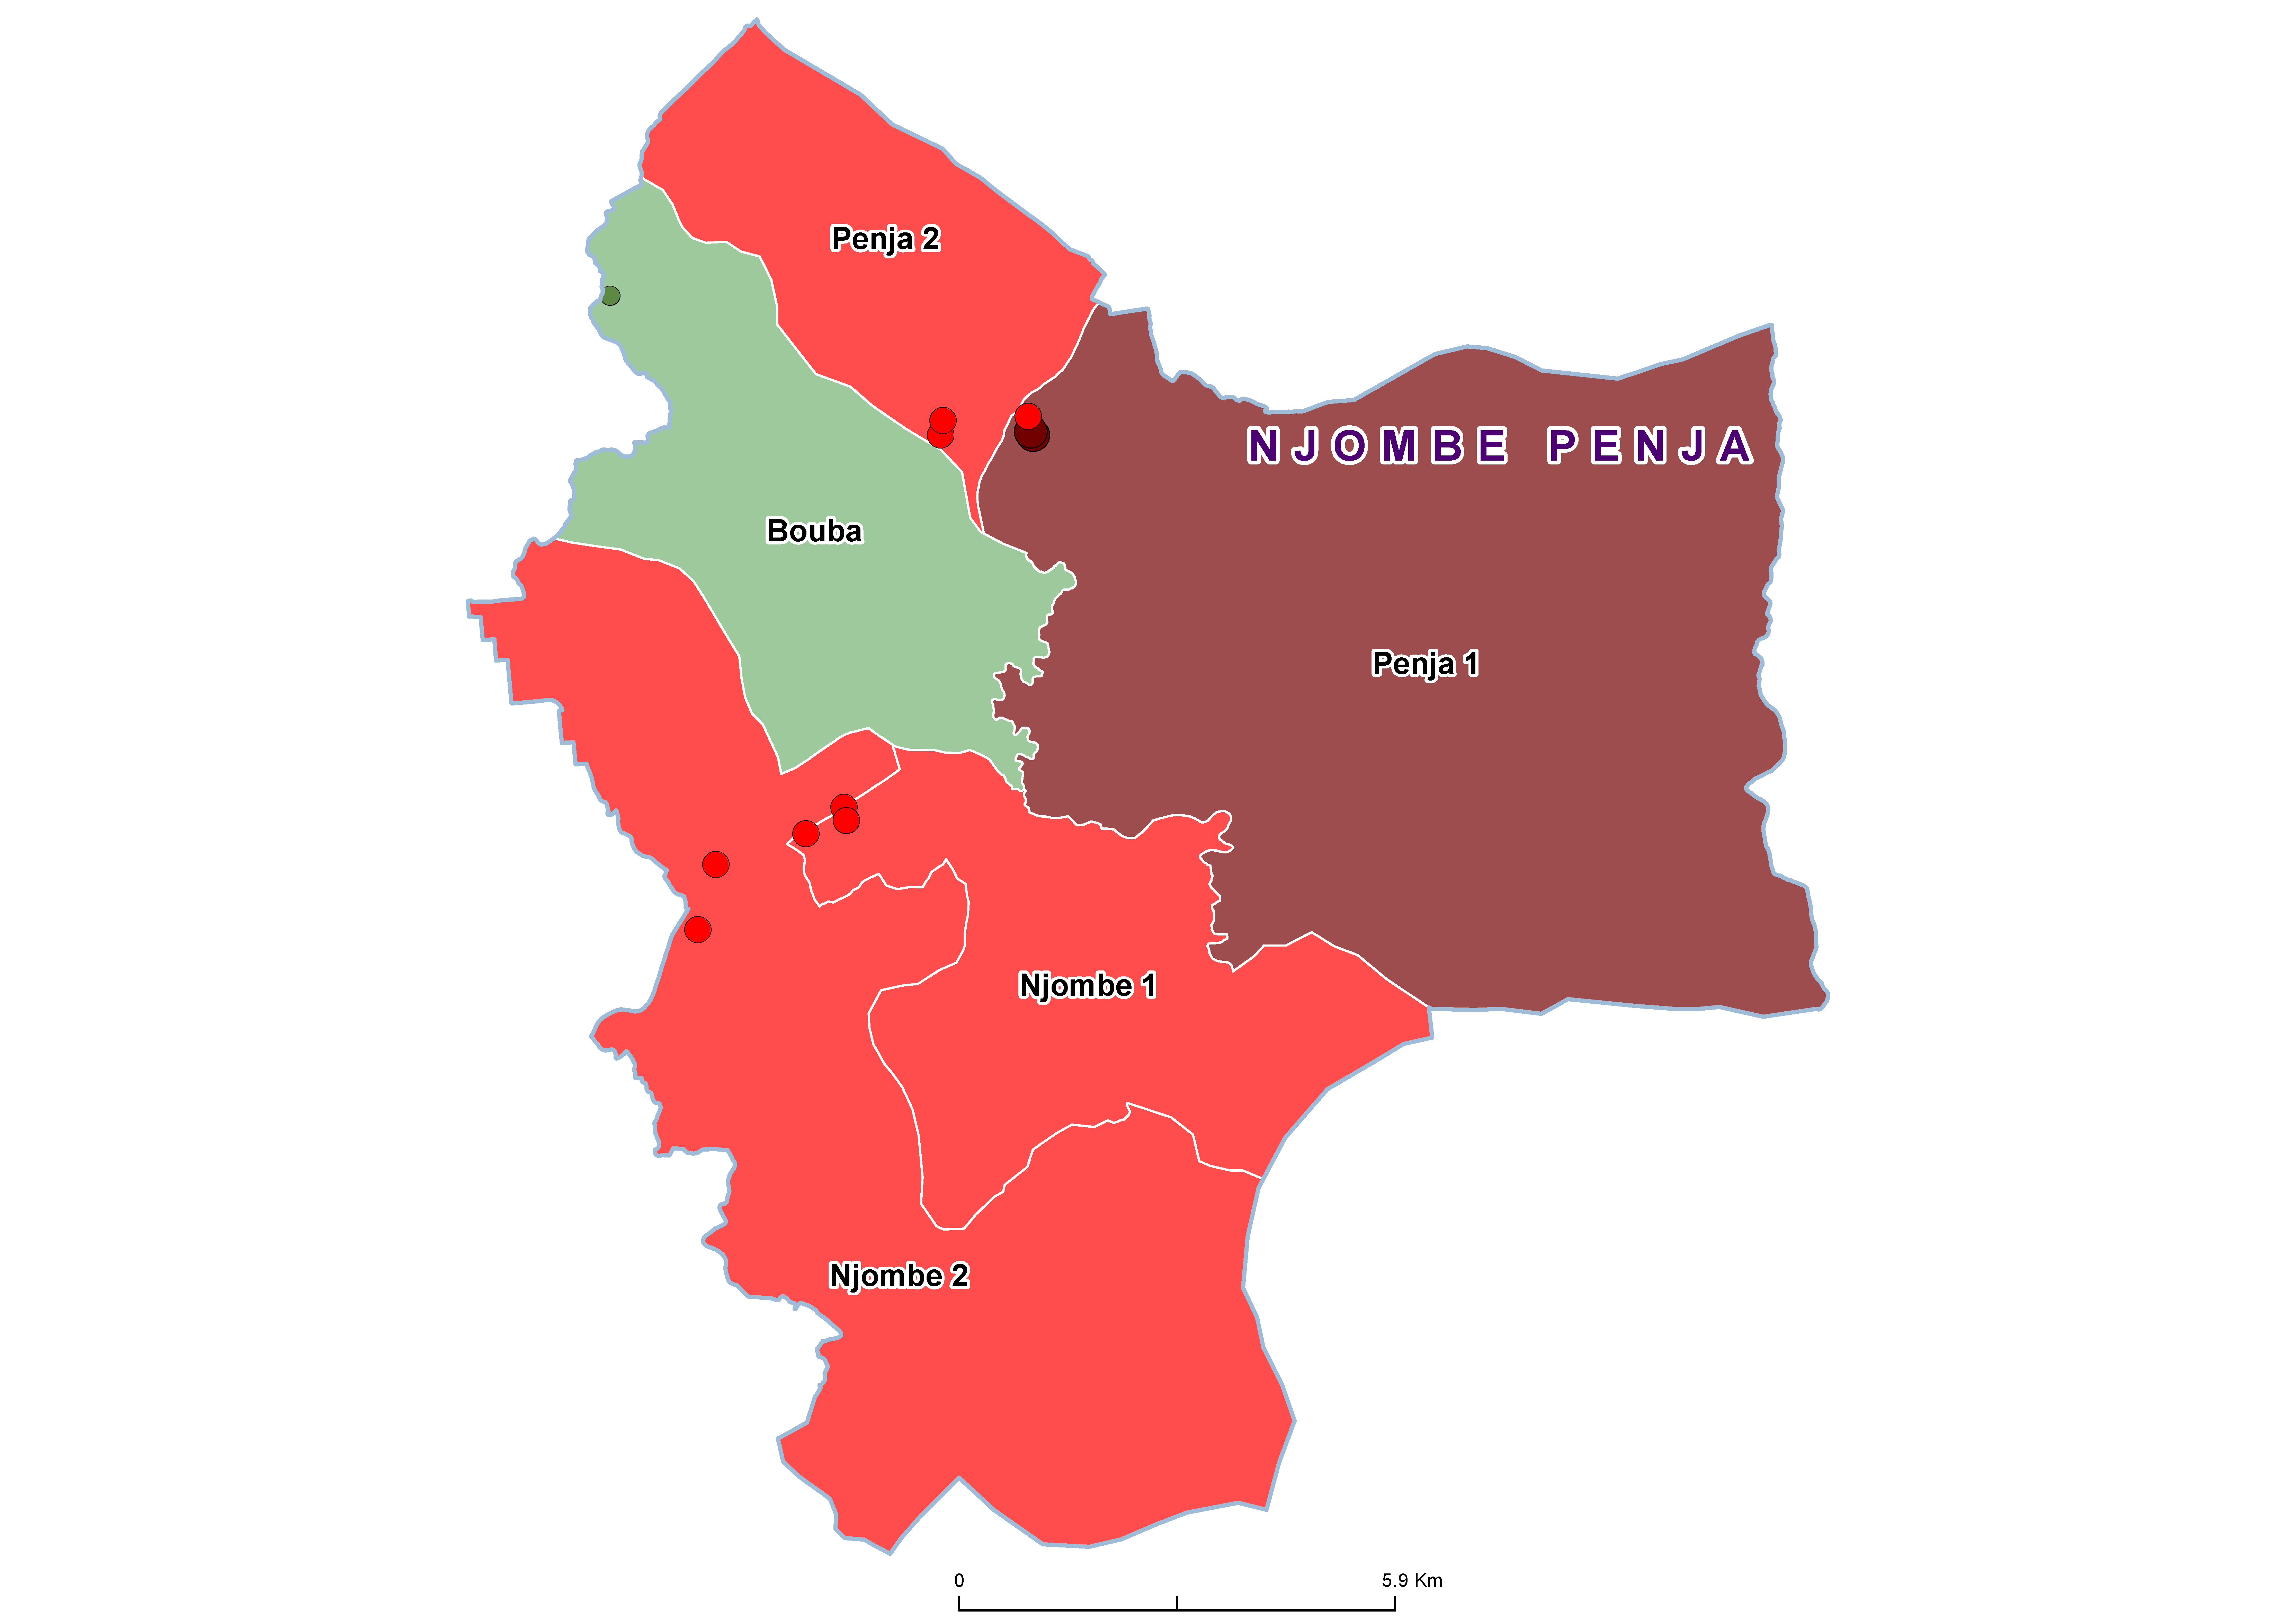 Njombe penja SCH 20180001